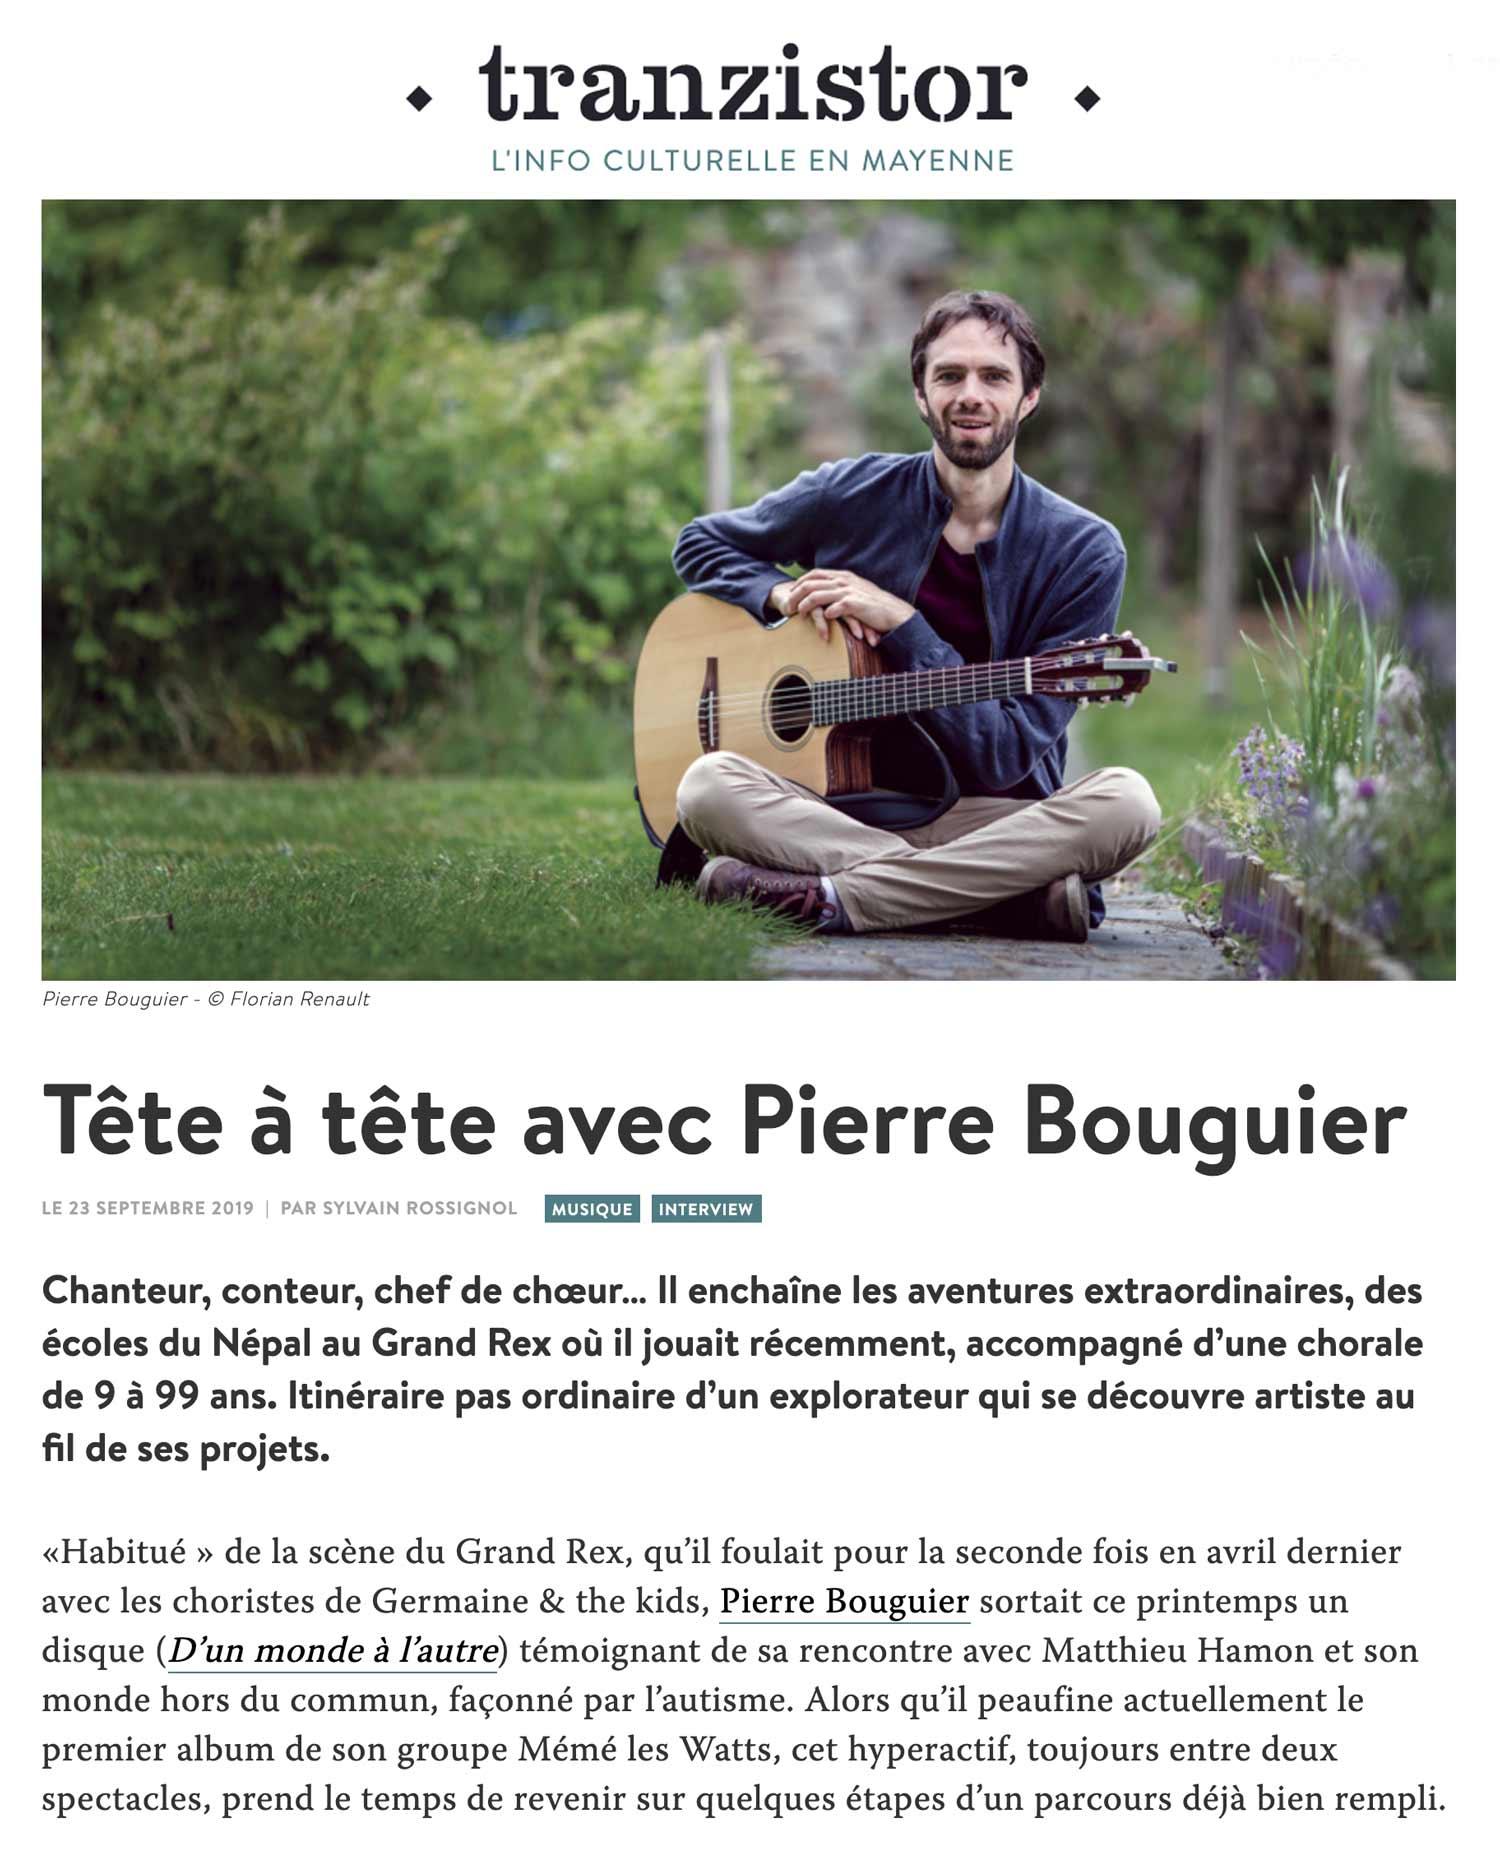 Pierre Bouguier interview tranzistor 2019